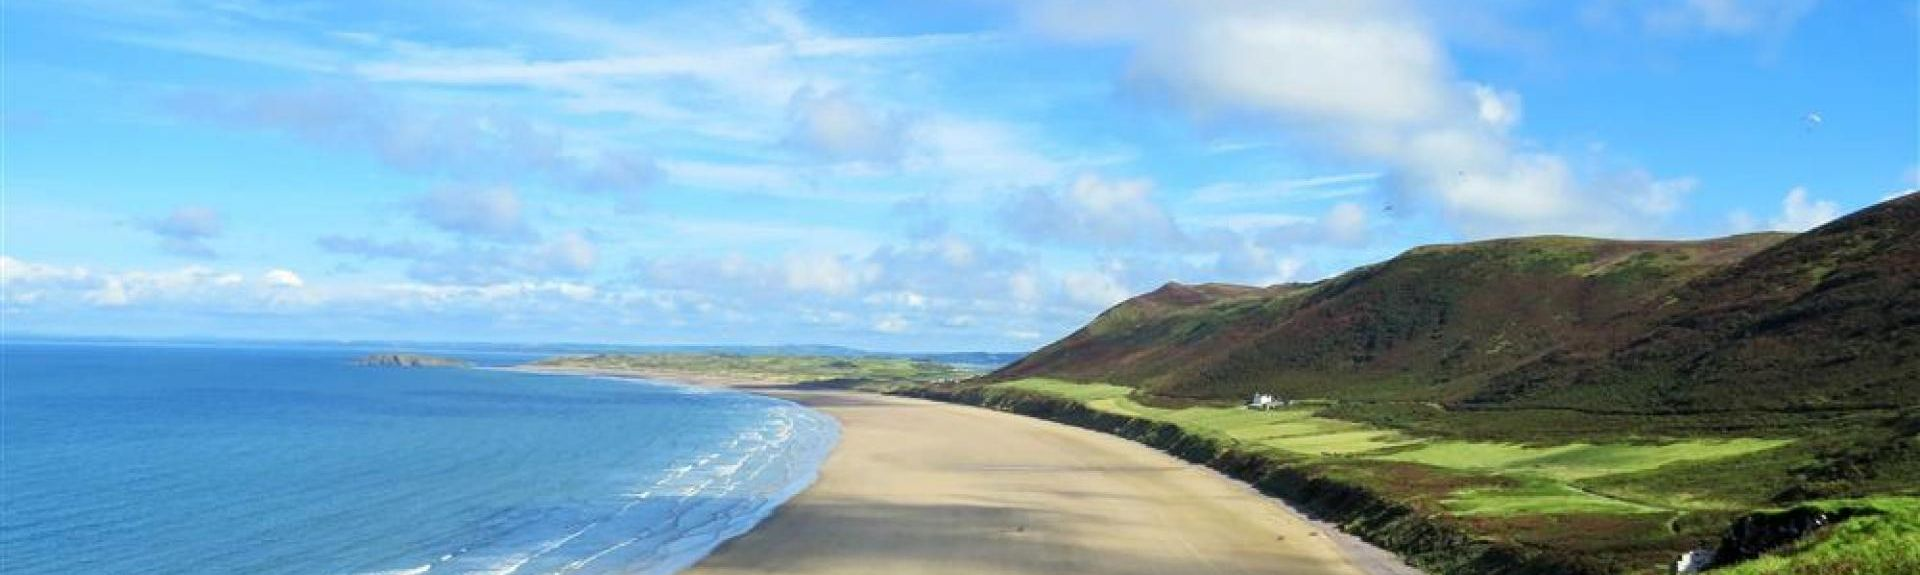 Playa de Rhossili, Gales, Reino Unido